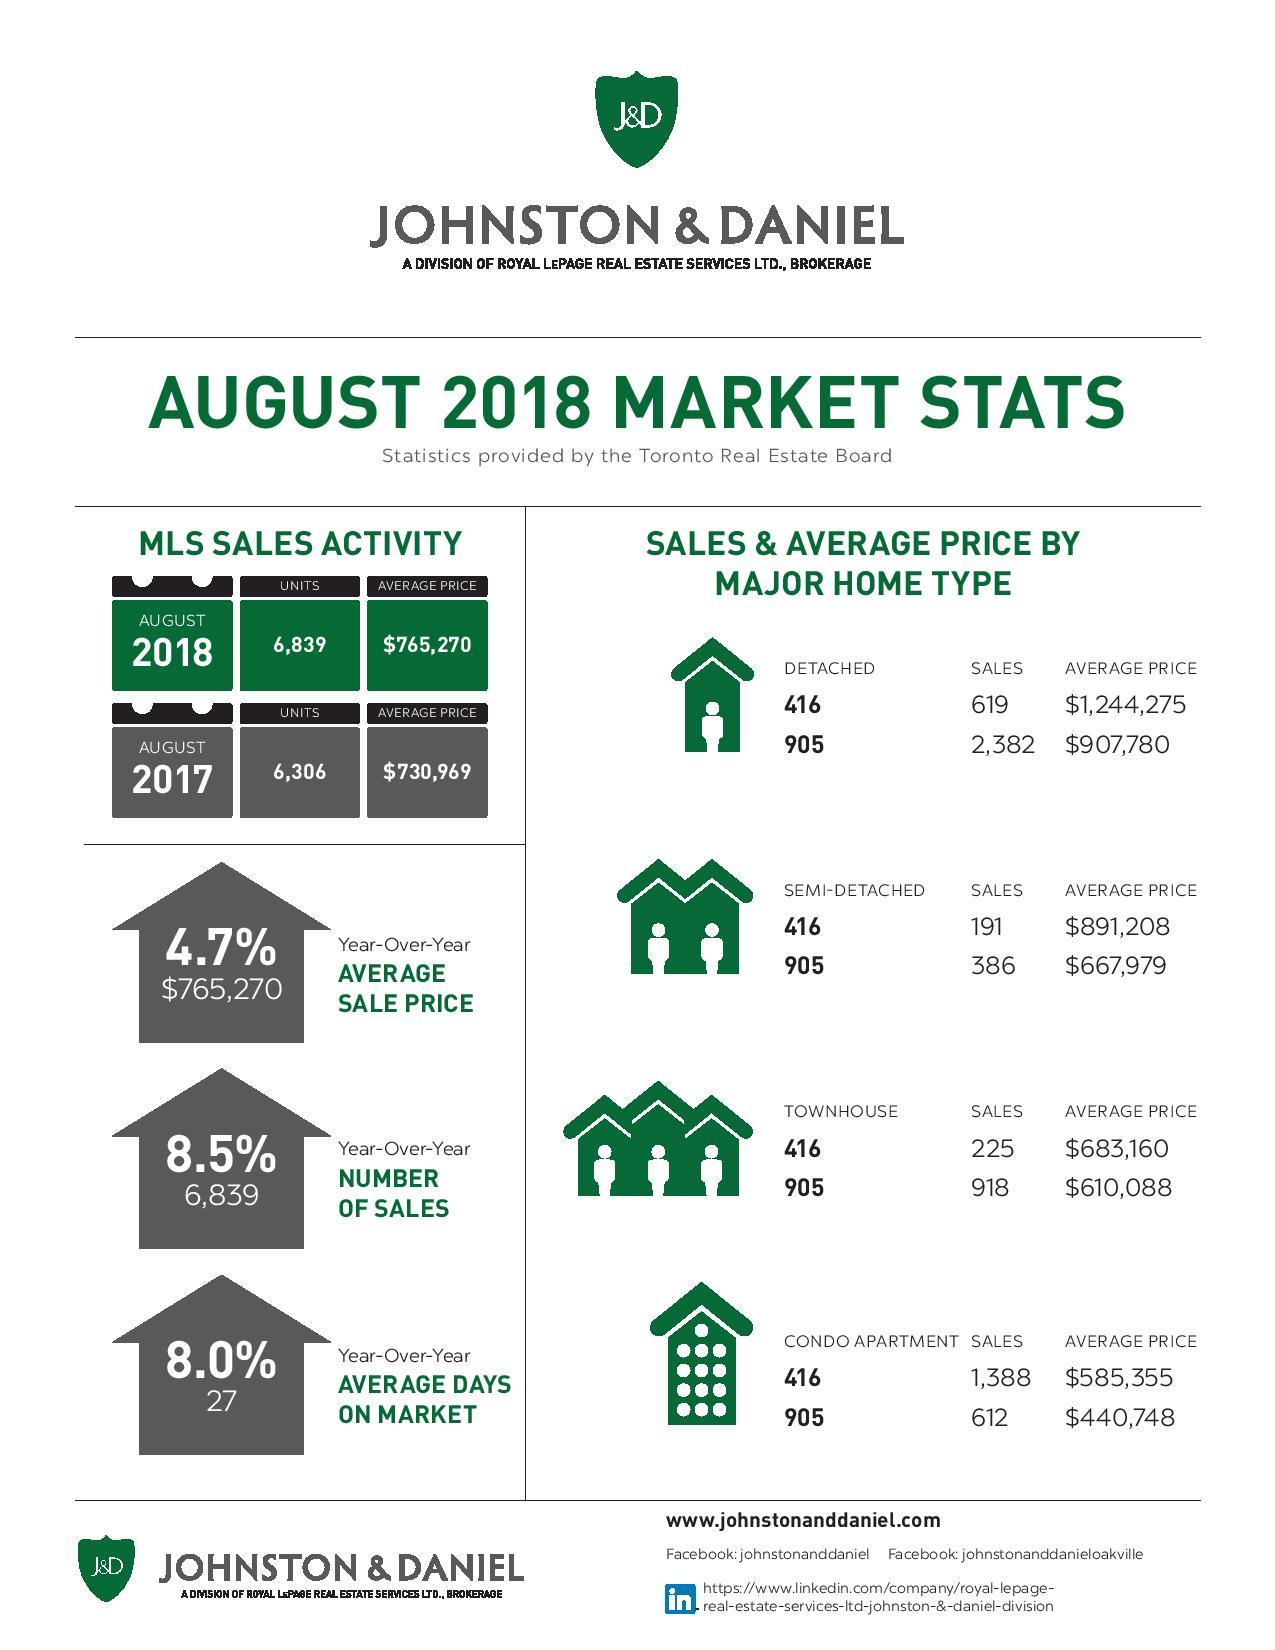 08 2018_AUG_Market_Stats_J&D-page-001.jpg